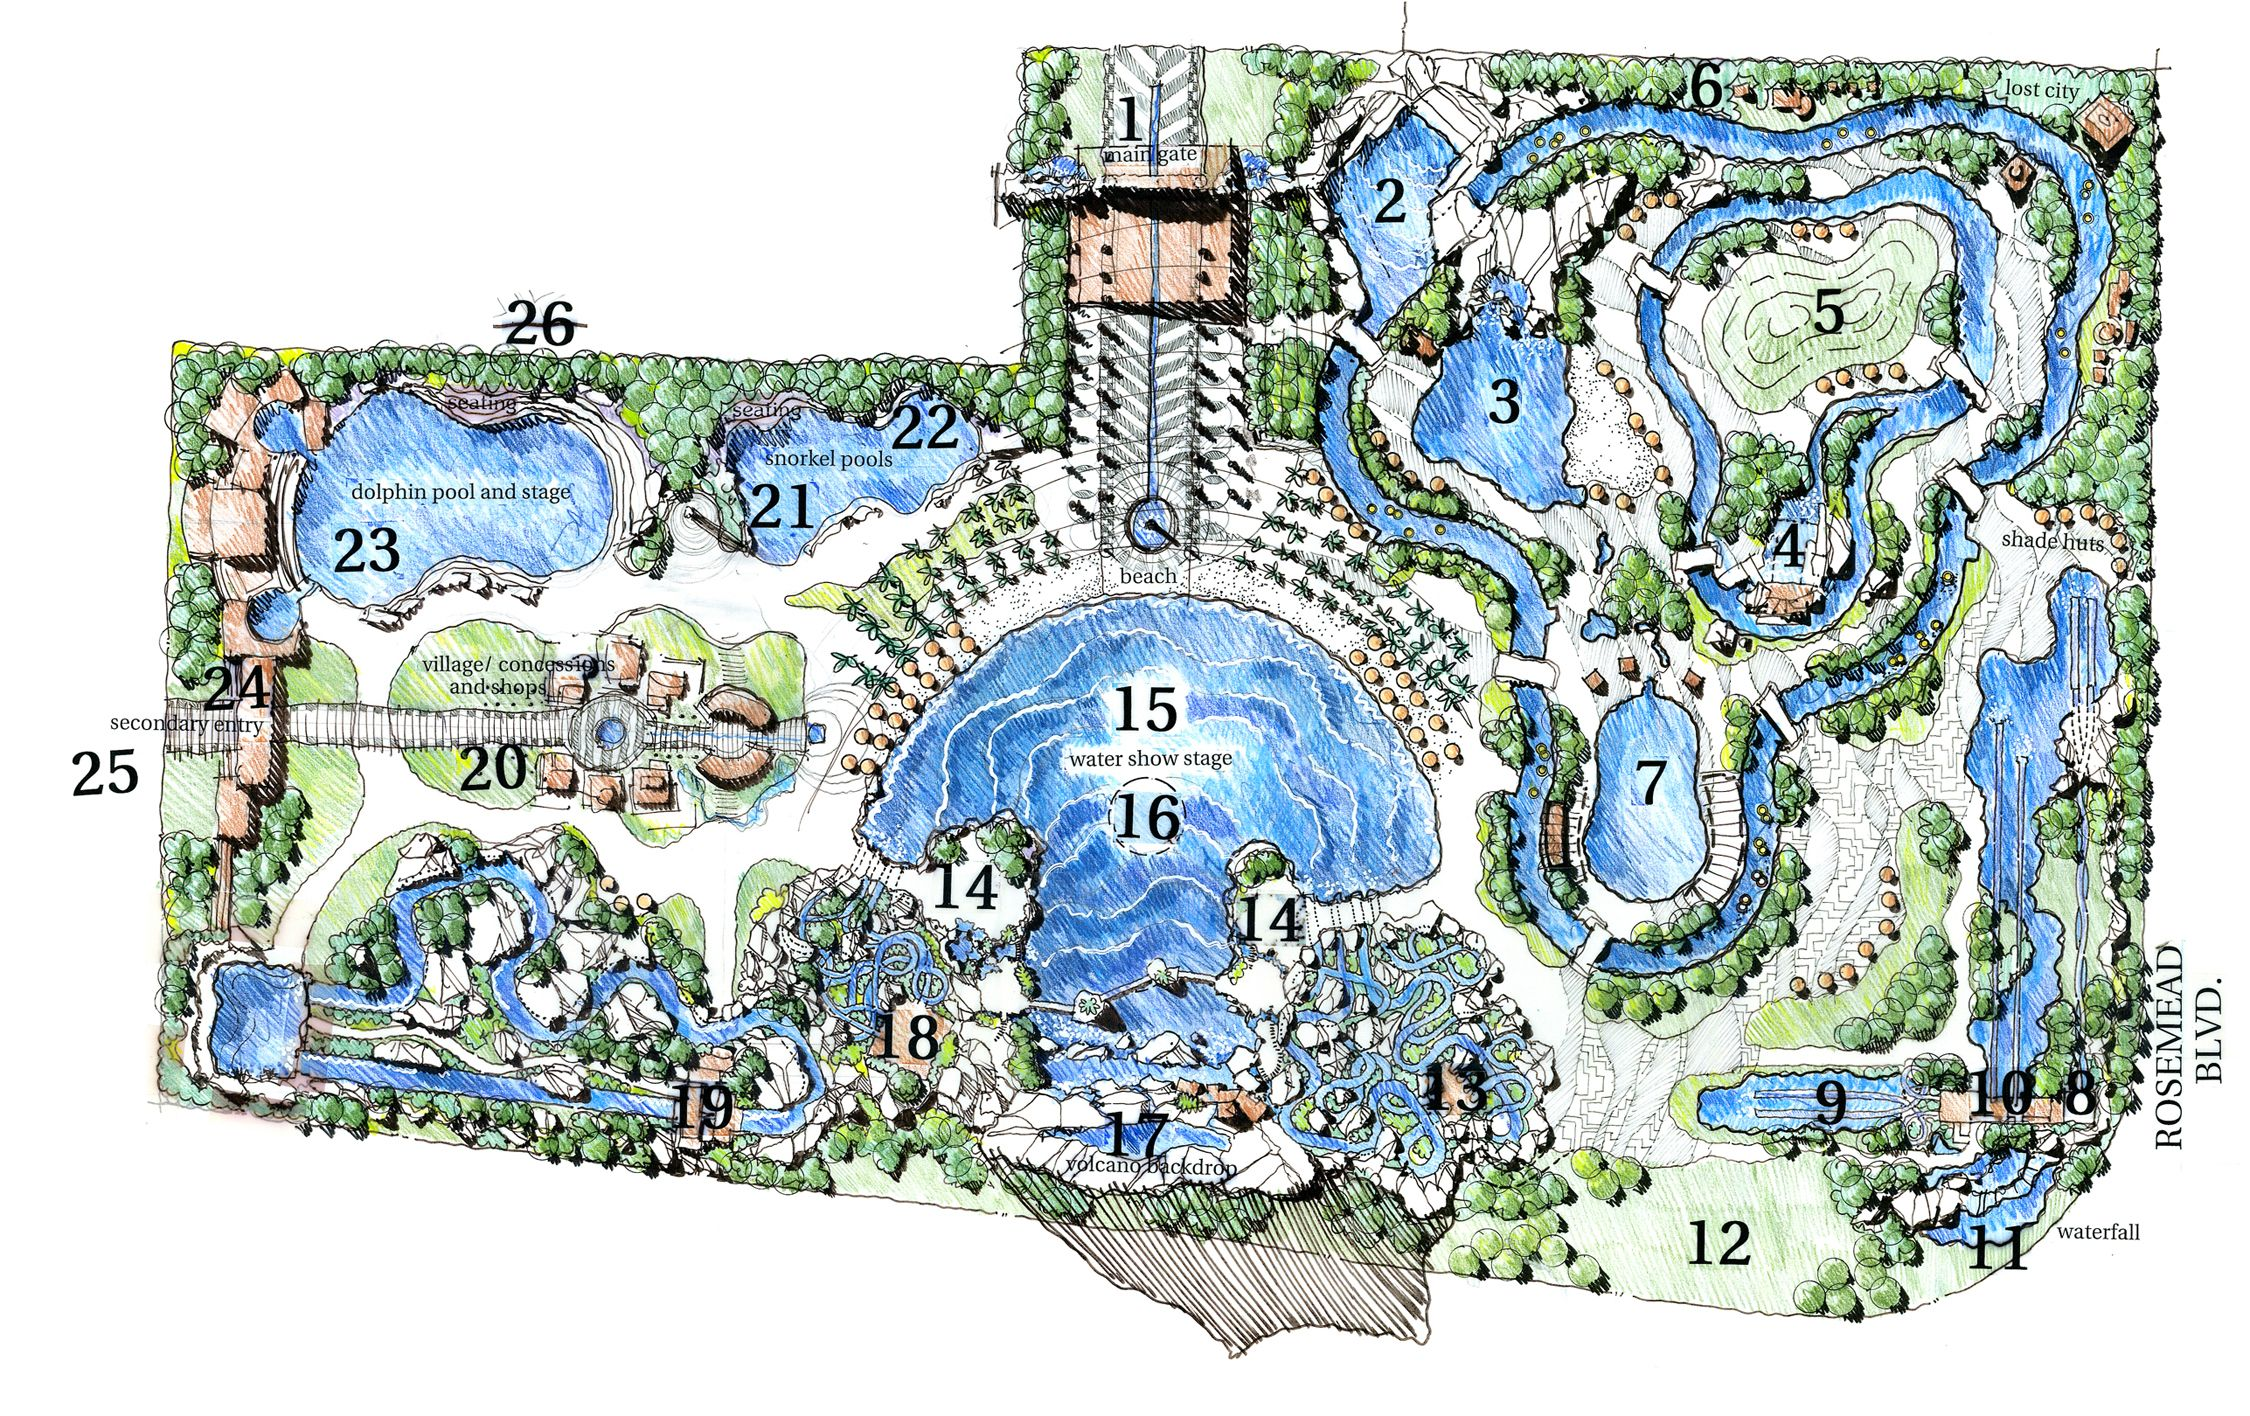 Caribe Jungle Water Park Las Americas Pico Rivera Ca By Nuvis Landscape Design Drawings Water Theme Park Landscape Plans